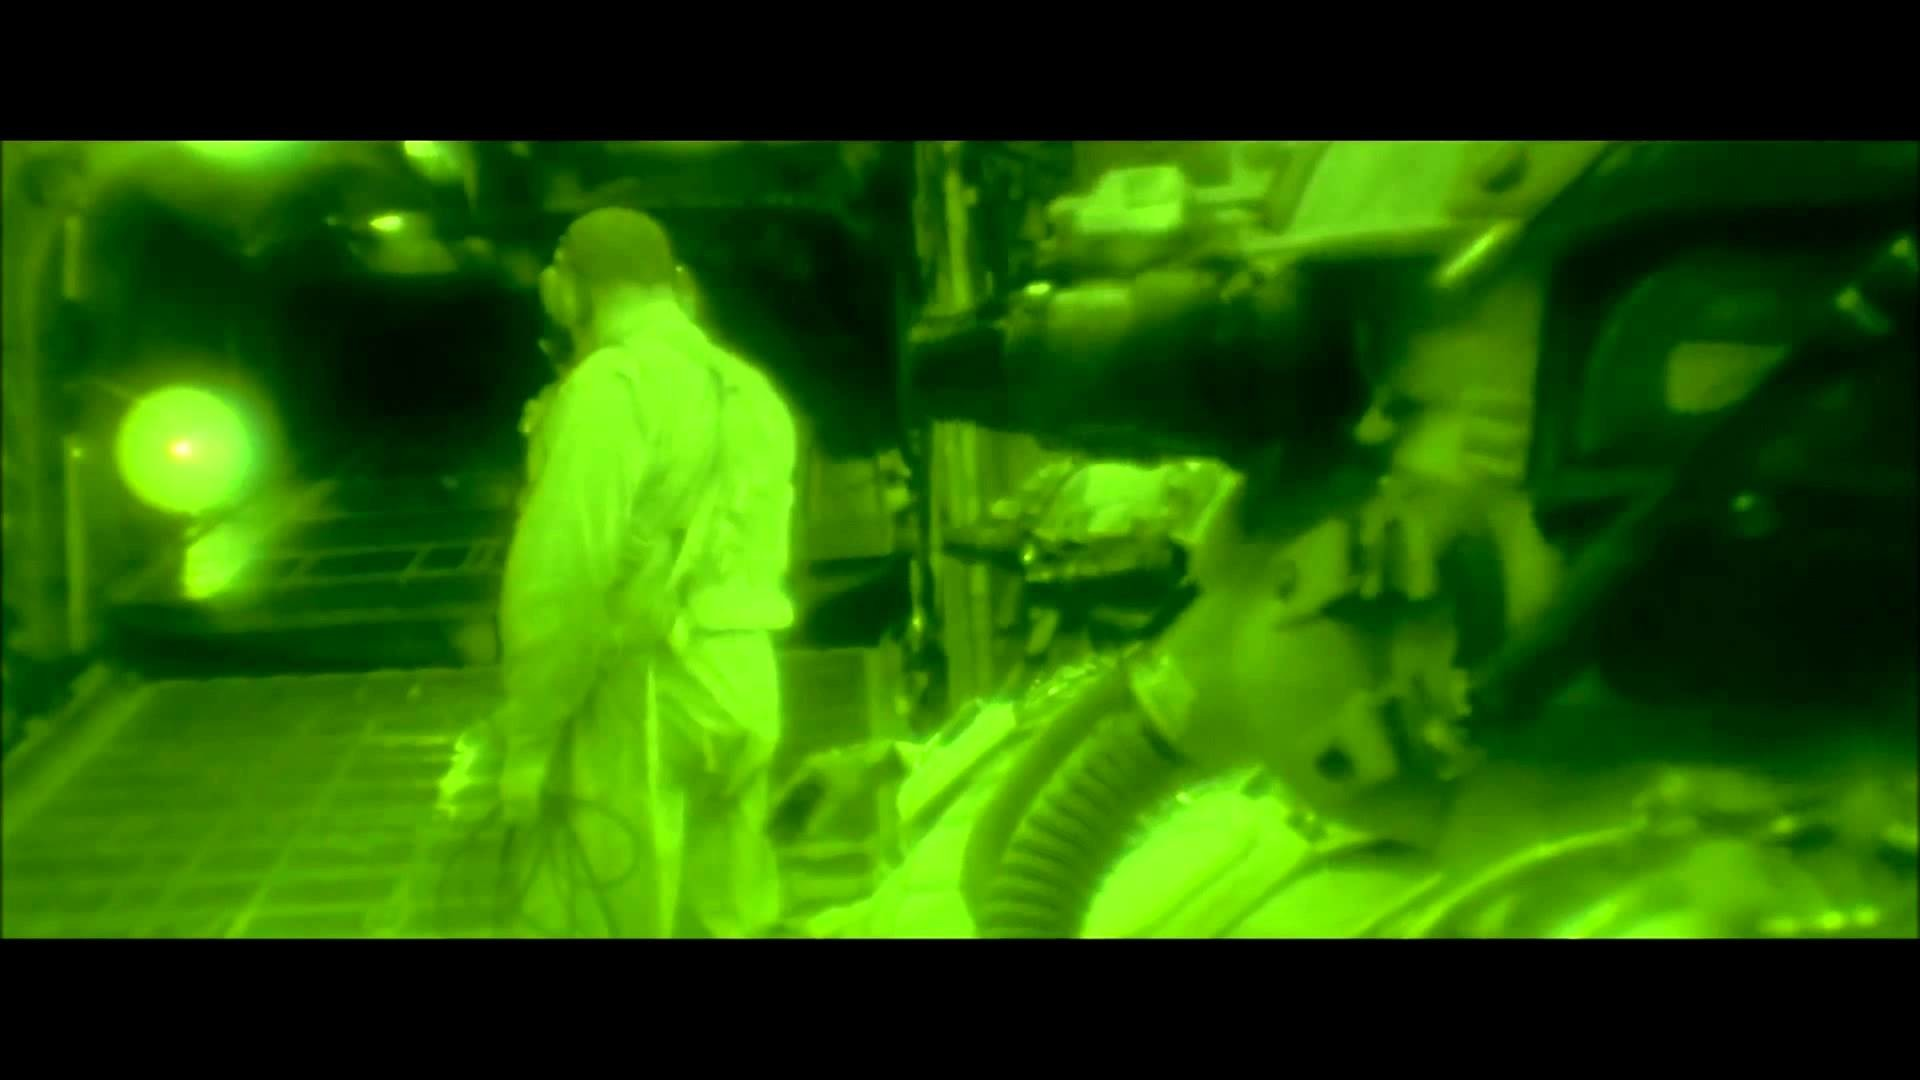 SEAL TEAM SIX | DEVGRU – Naval Special Warfare Development Group – YouTube